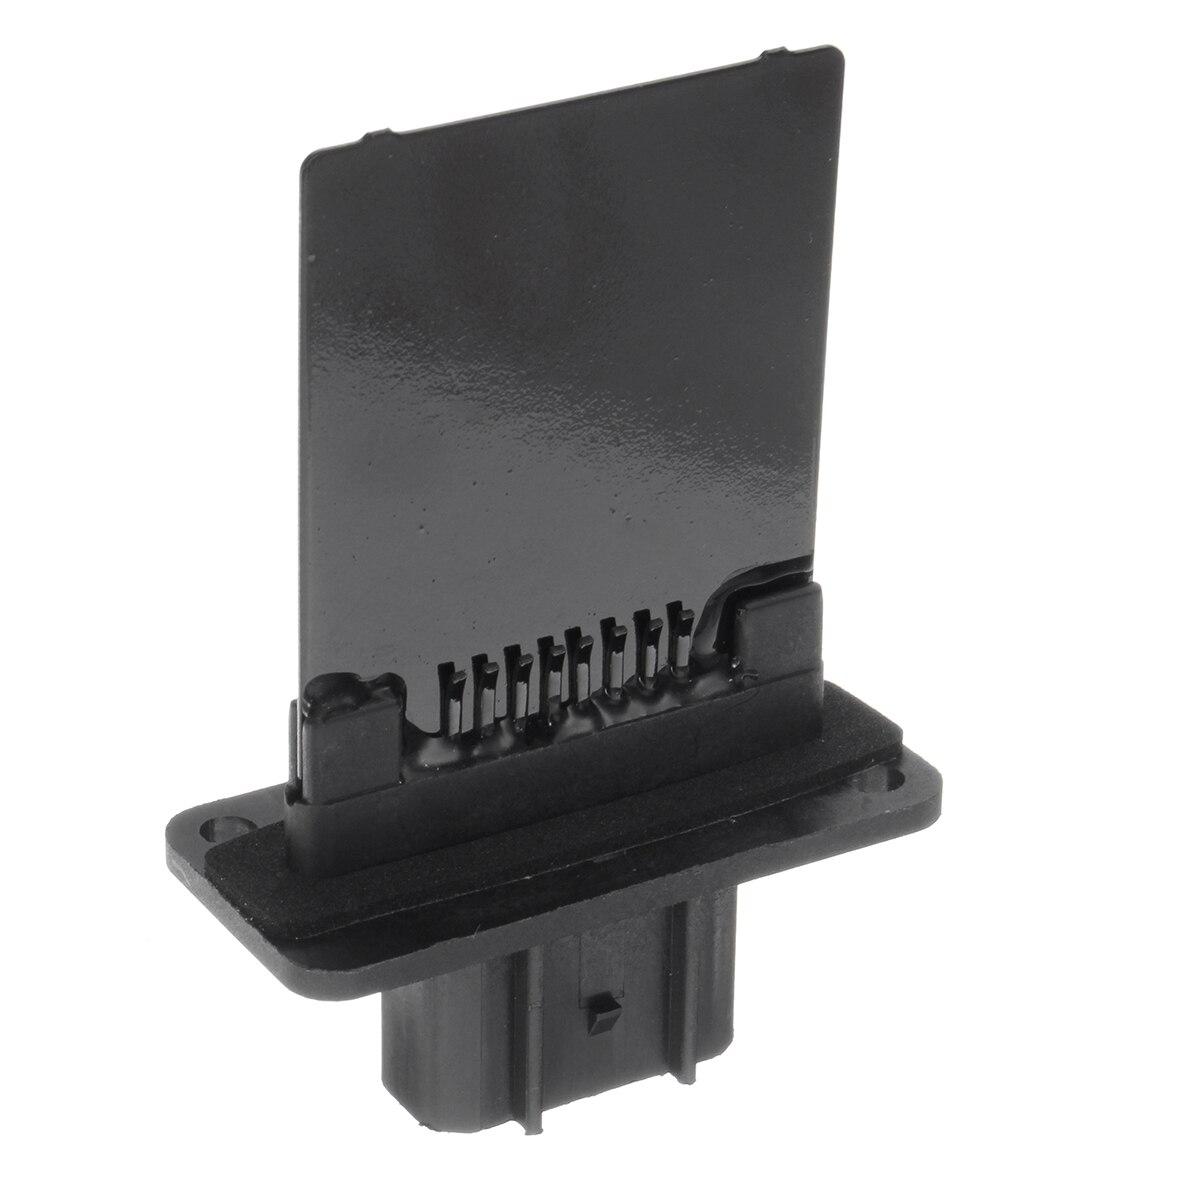 Resistor frontal de motor de ventilador negro para Ford Escape 2008-2012 para Taurus Mariner Sable 2008-2009 8G1Z19A706A 8G1Z-19A706-A 5369847